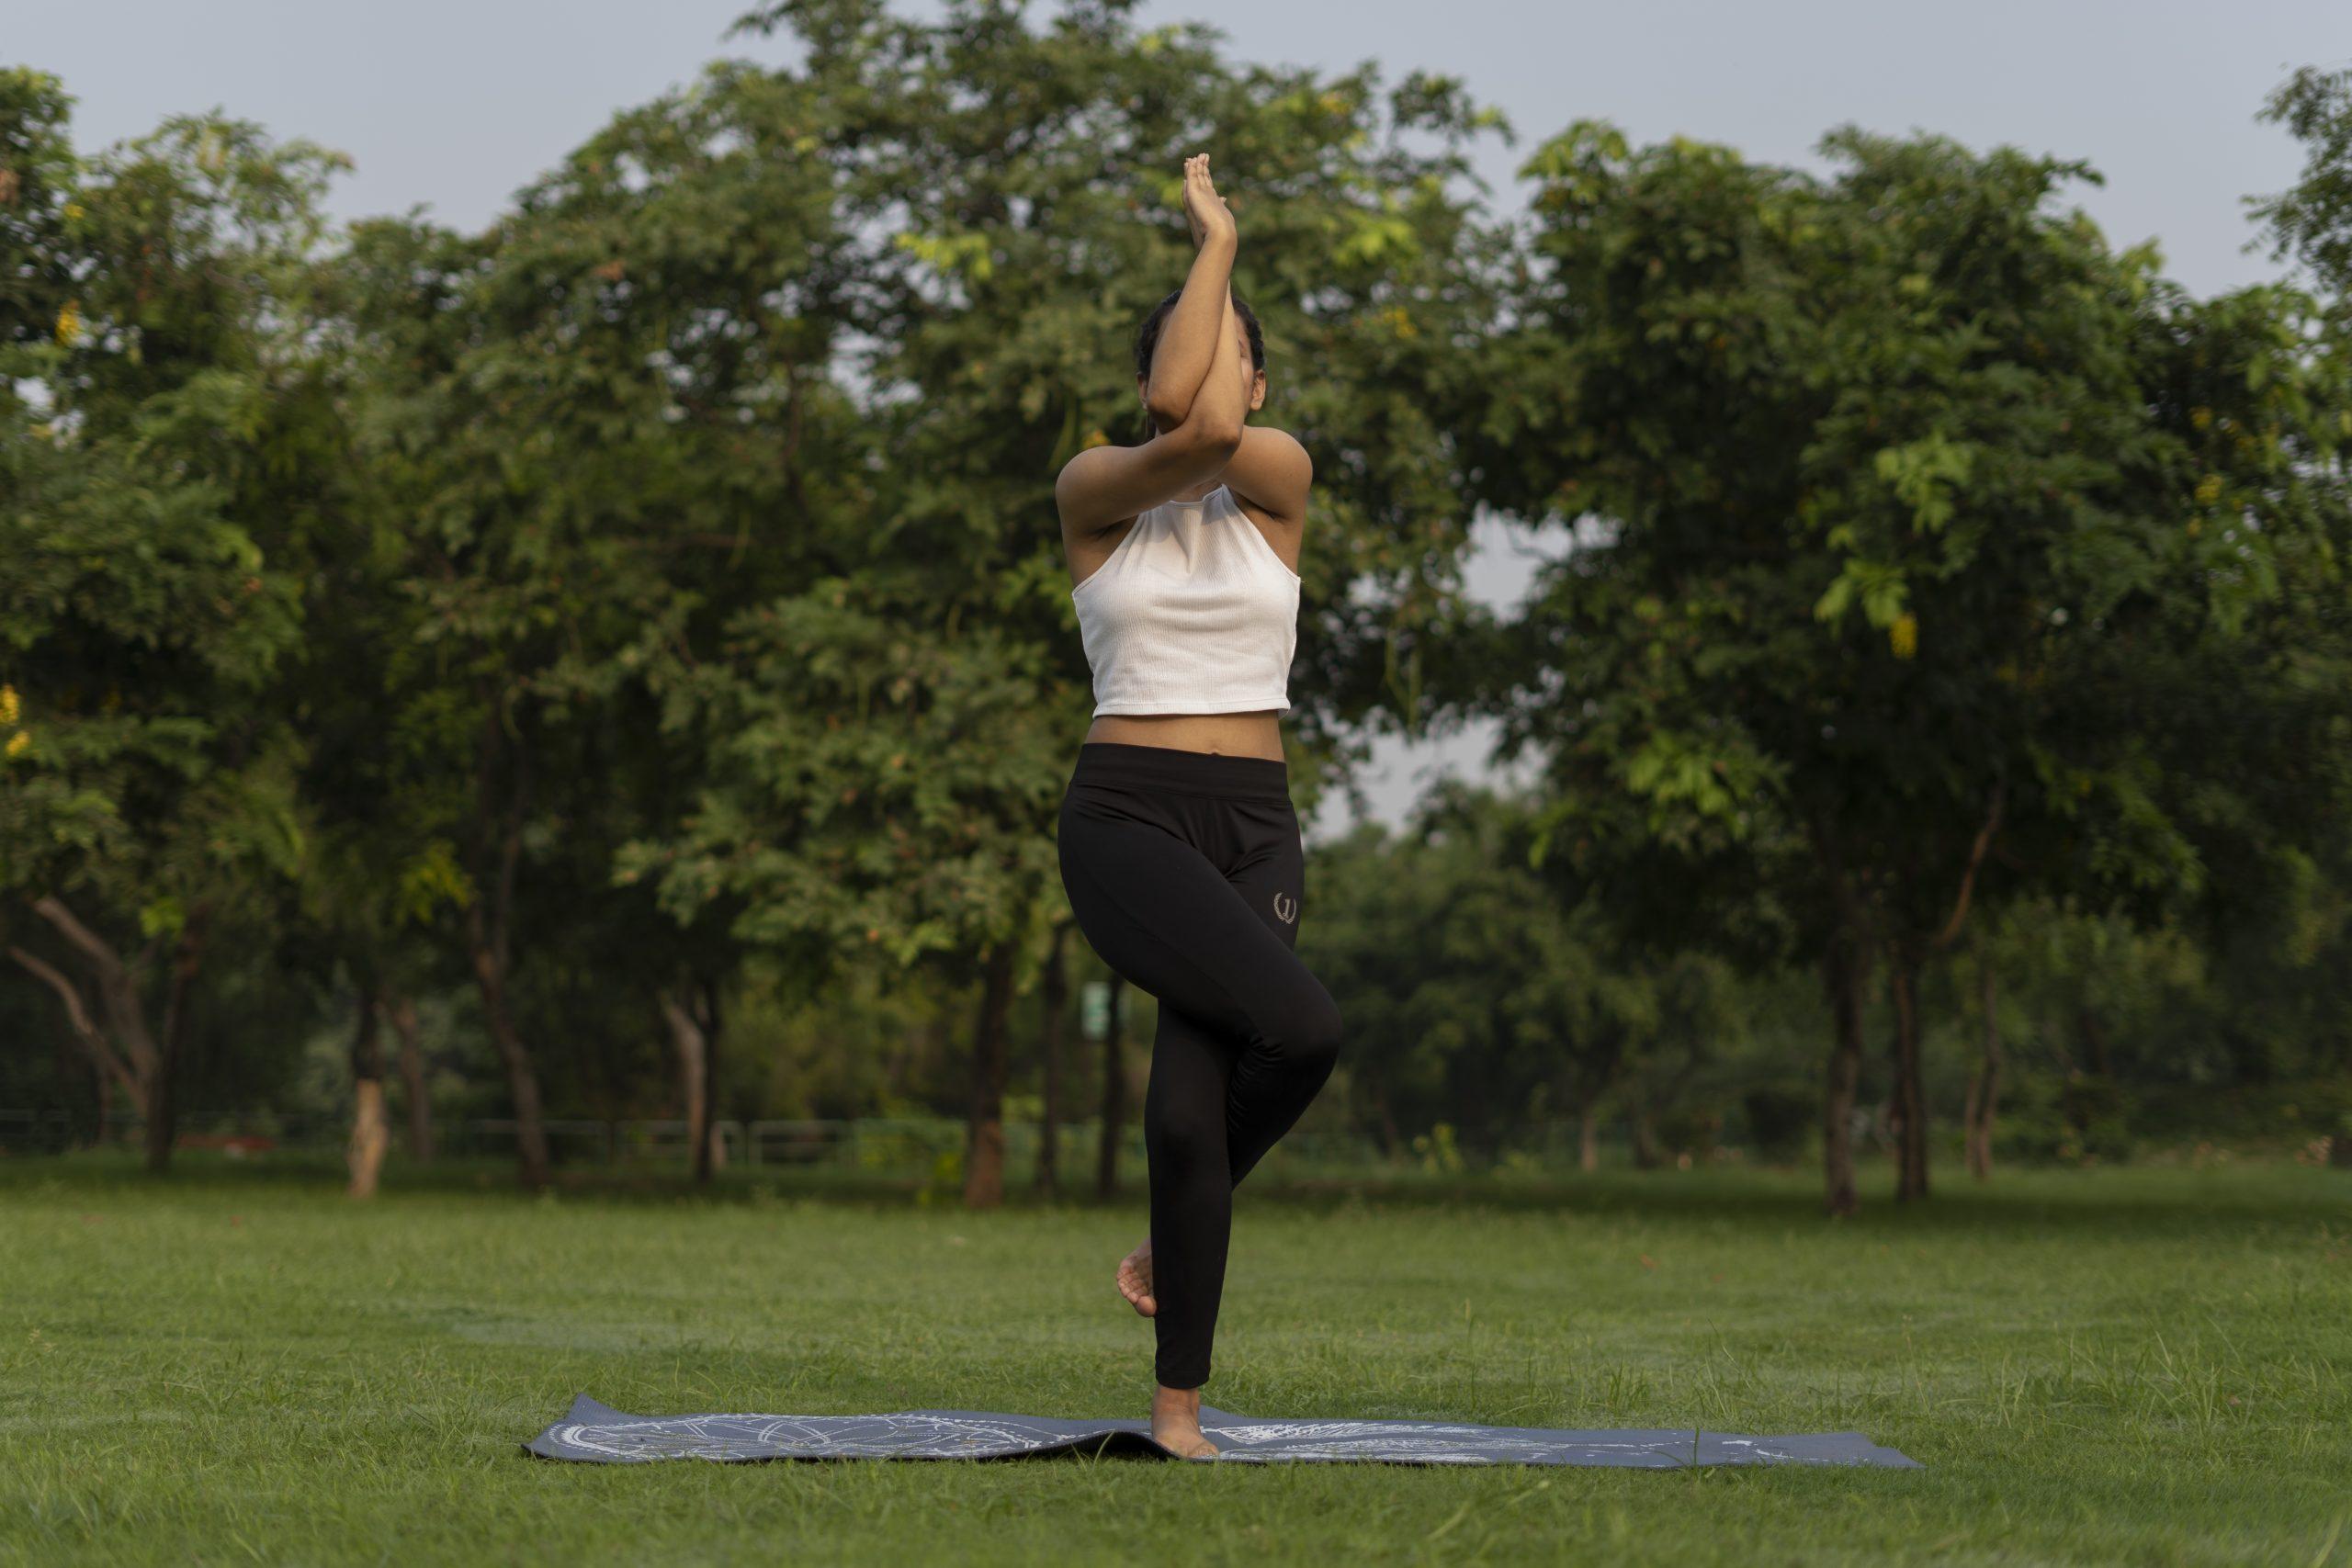 Garudasana front angle (eagle yoga pose)